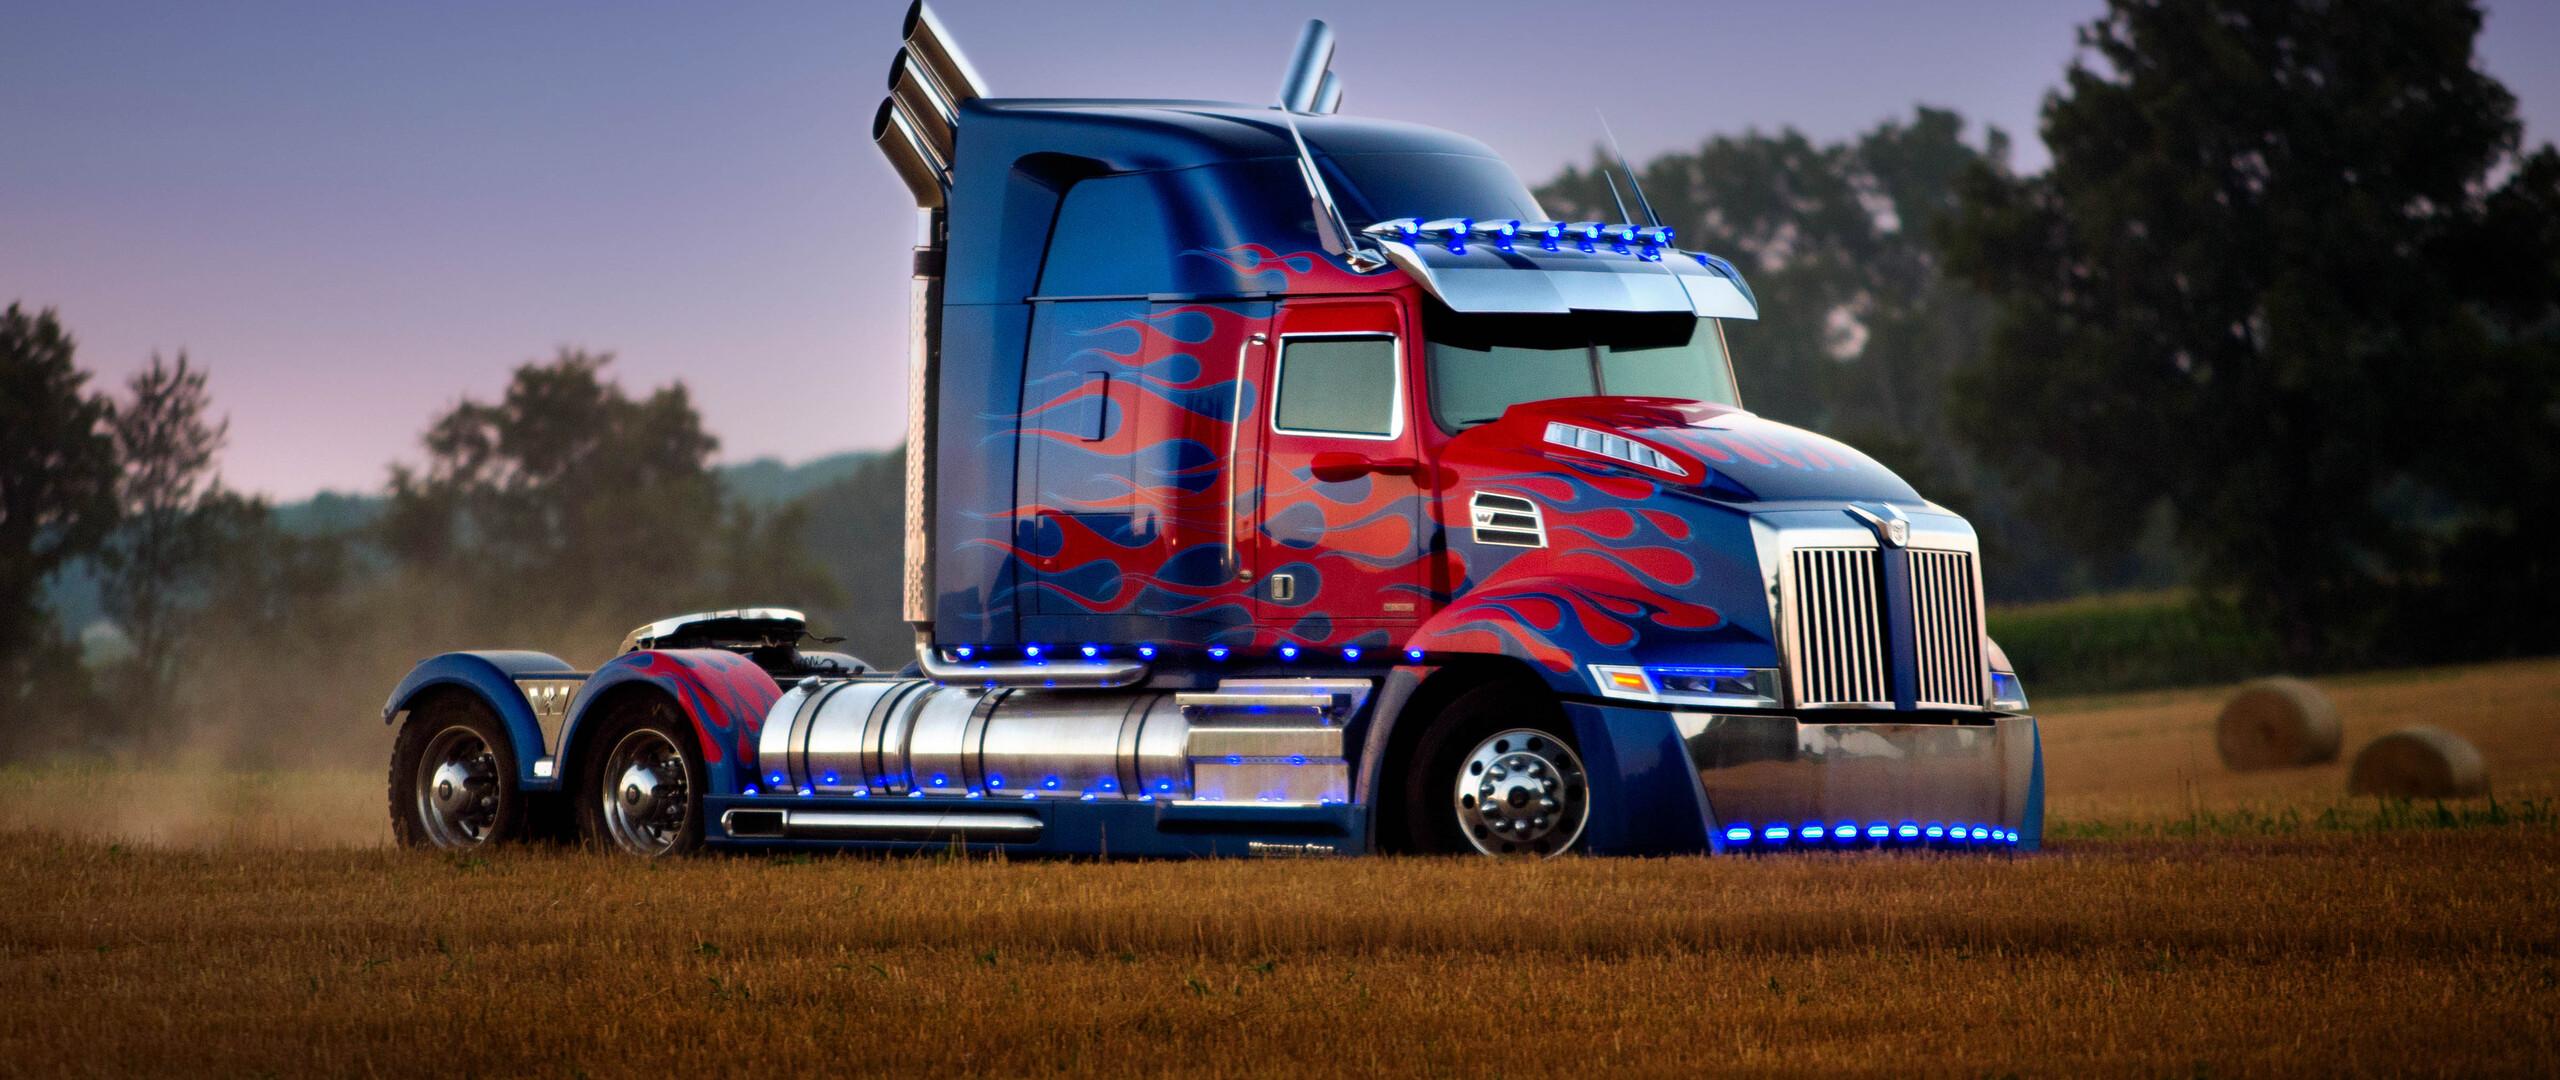 2560x1080 Transformers The Last Knight 5 Optimus Prime